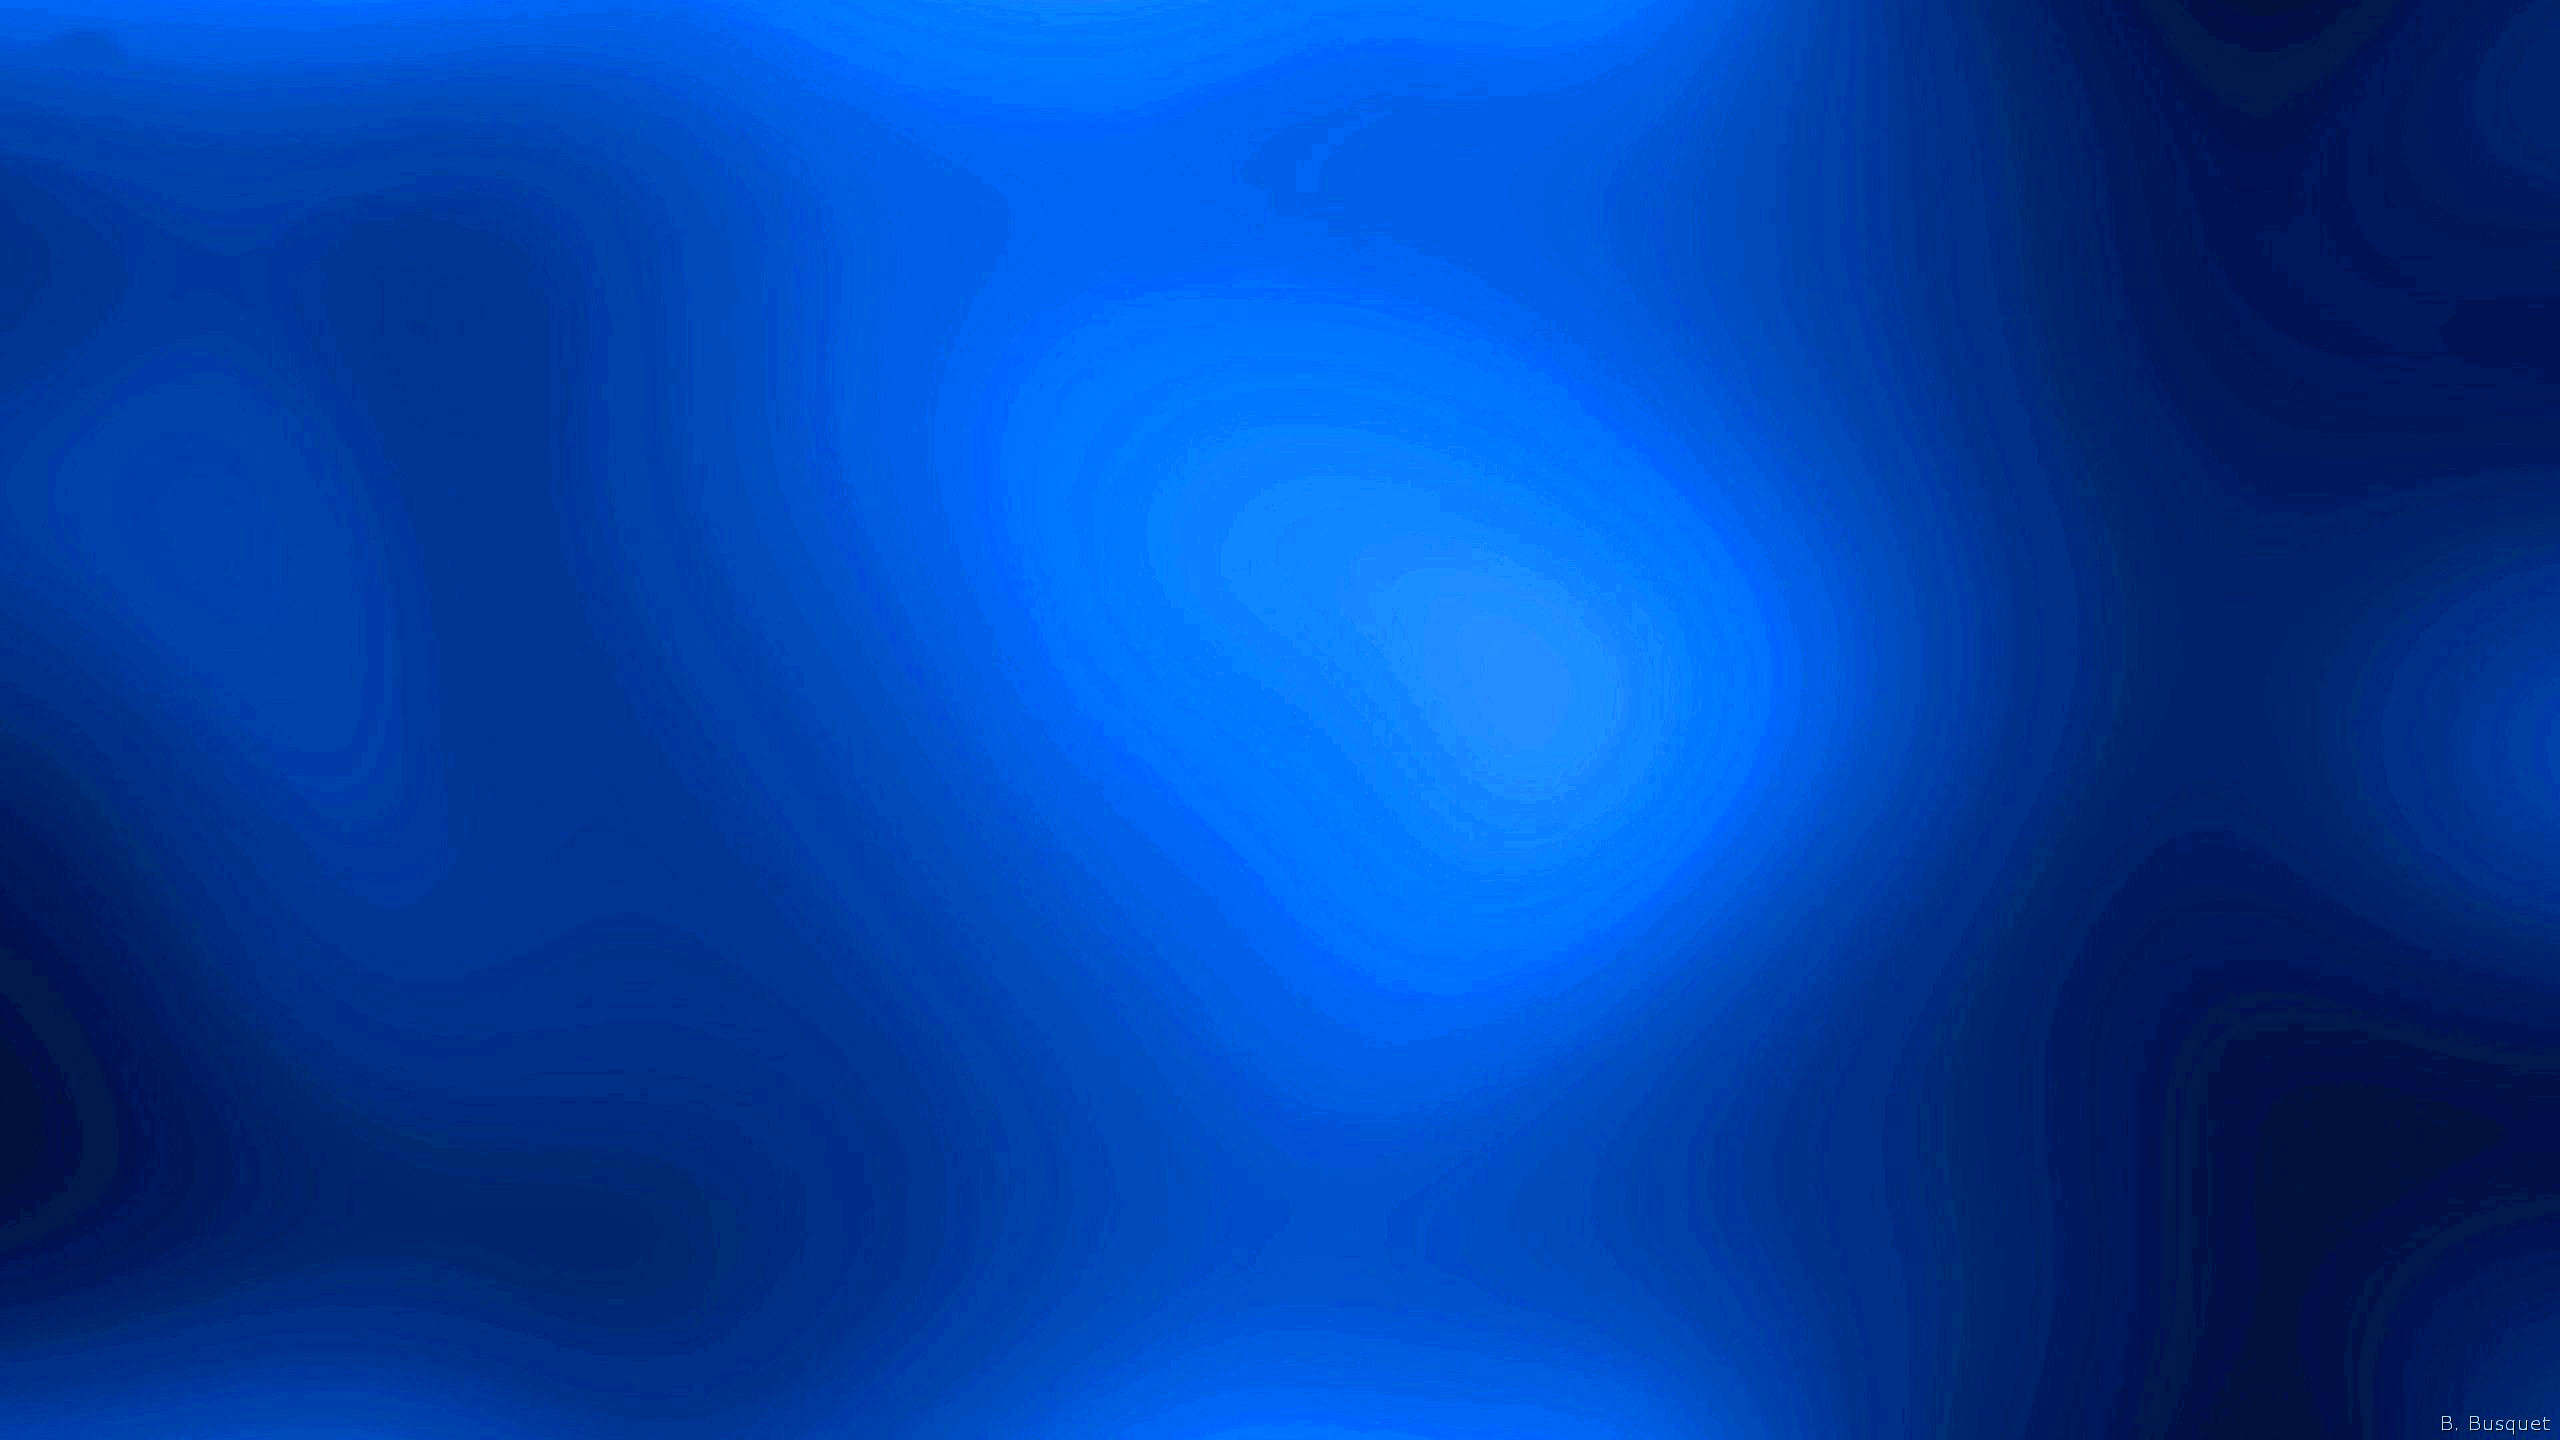 Res: 2560x1440, Blue gradient wallpaper